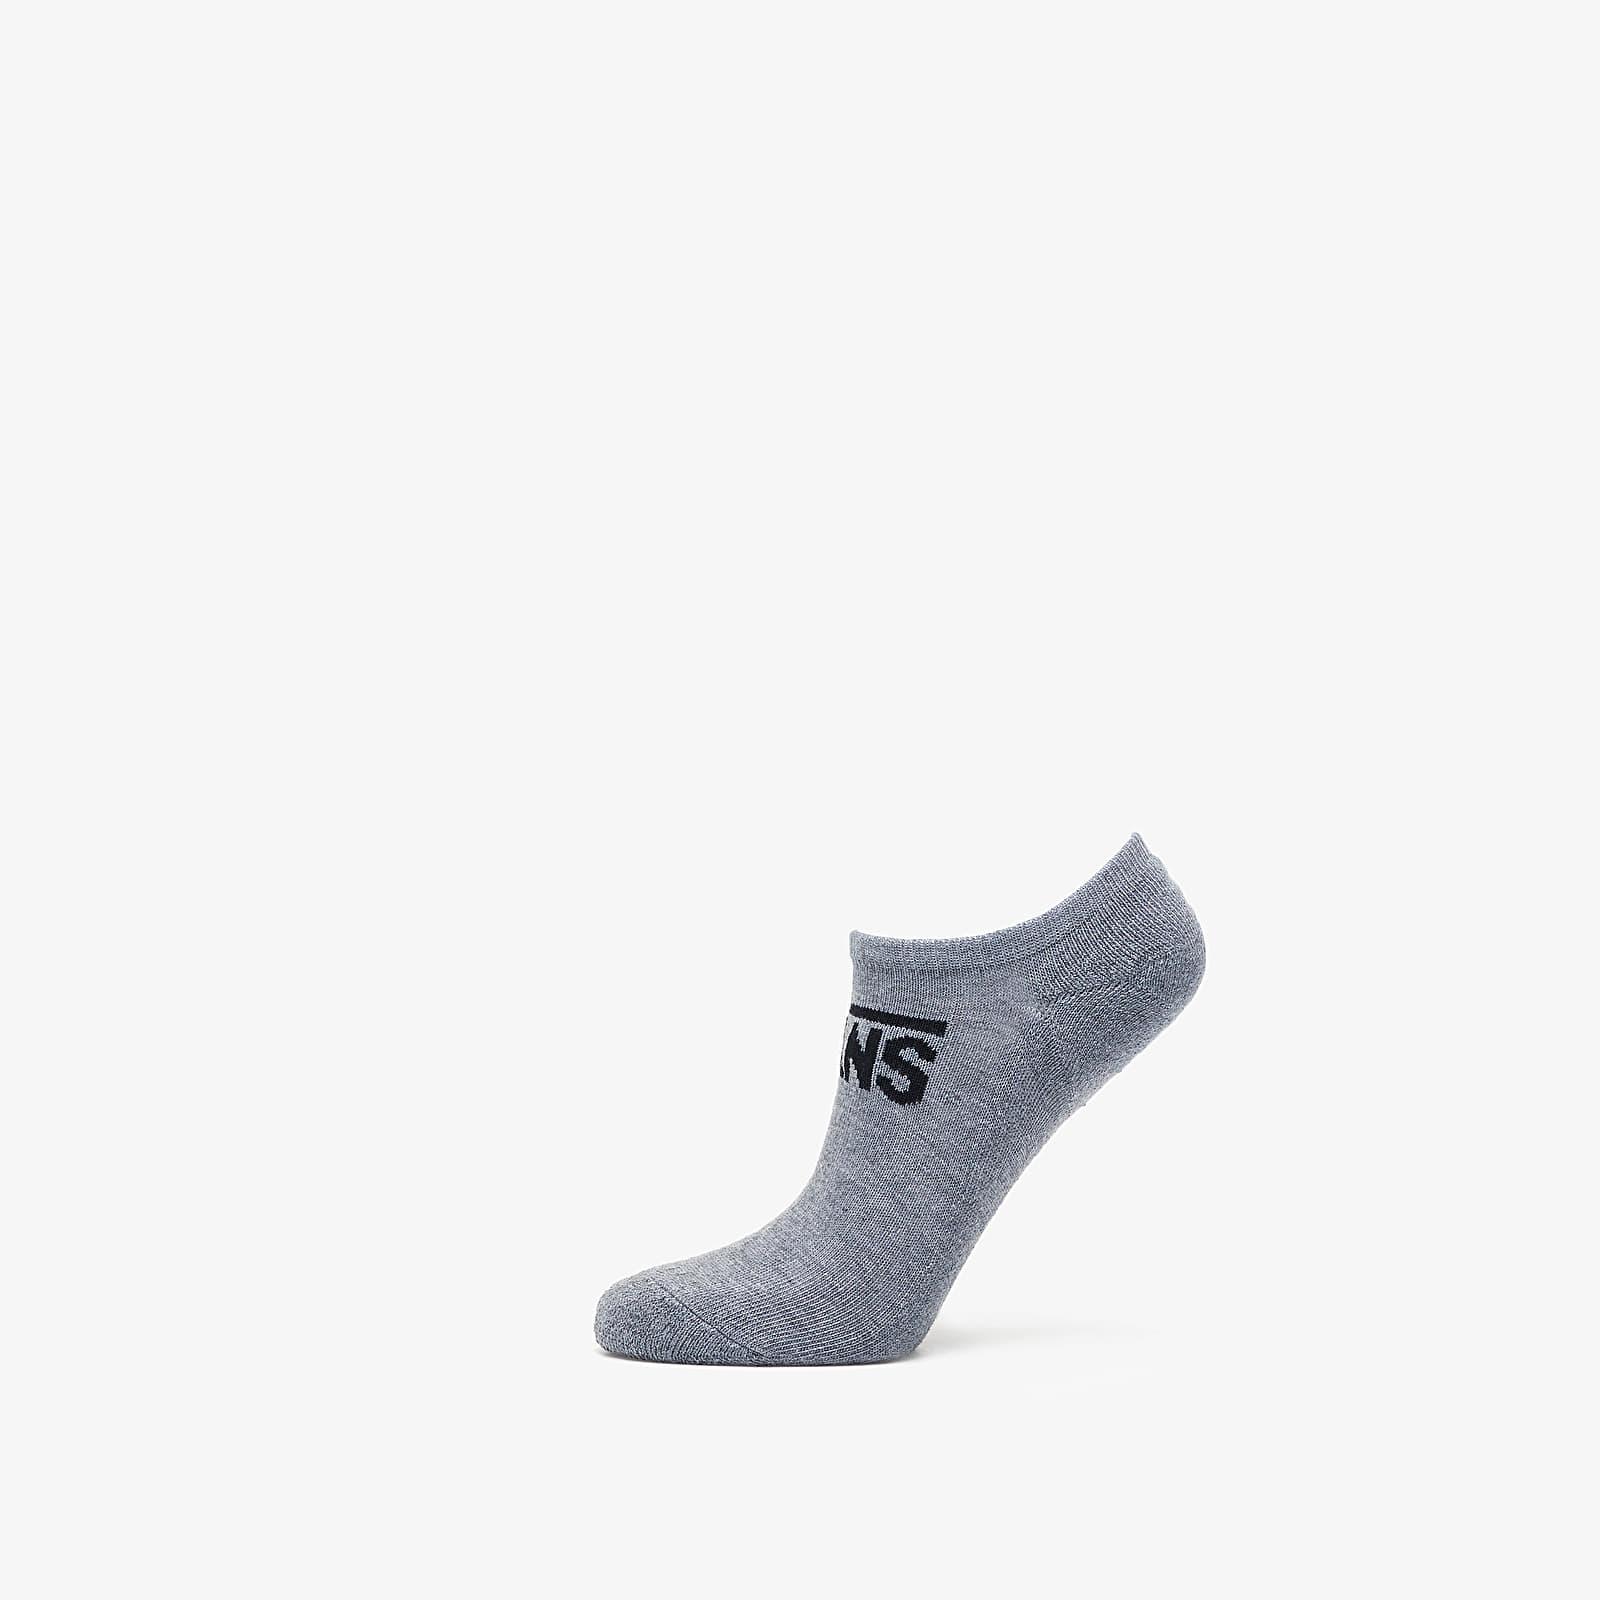 Vans Socks 3-Pack